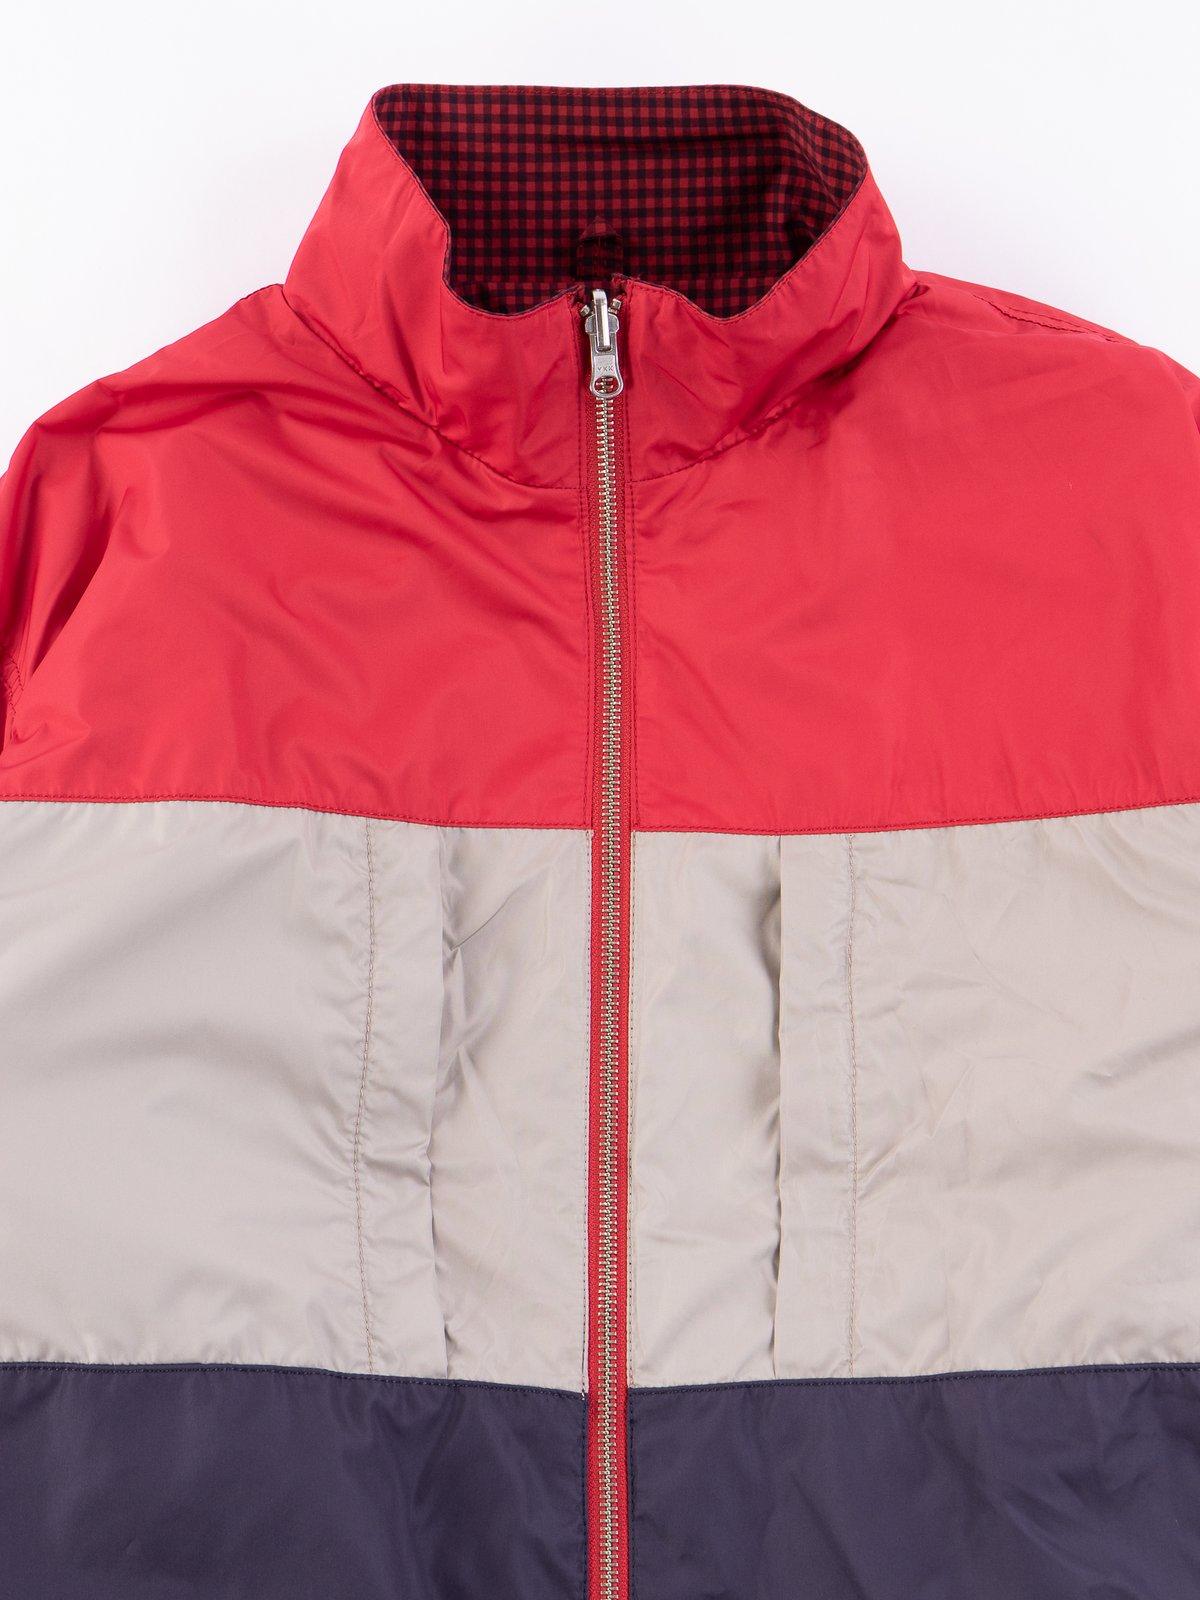 Red Gingham Reversible Jacket - Image 7